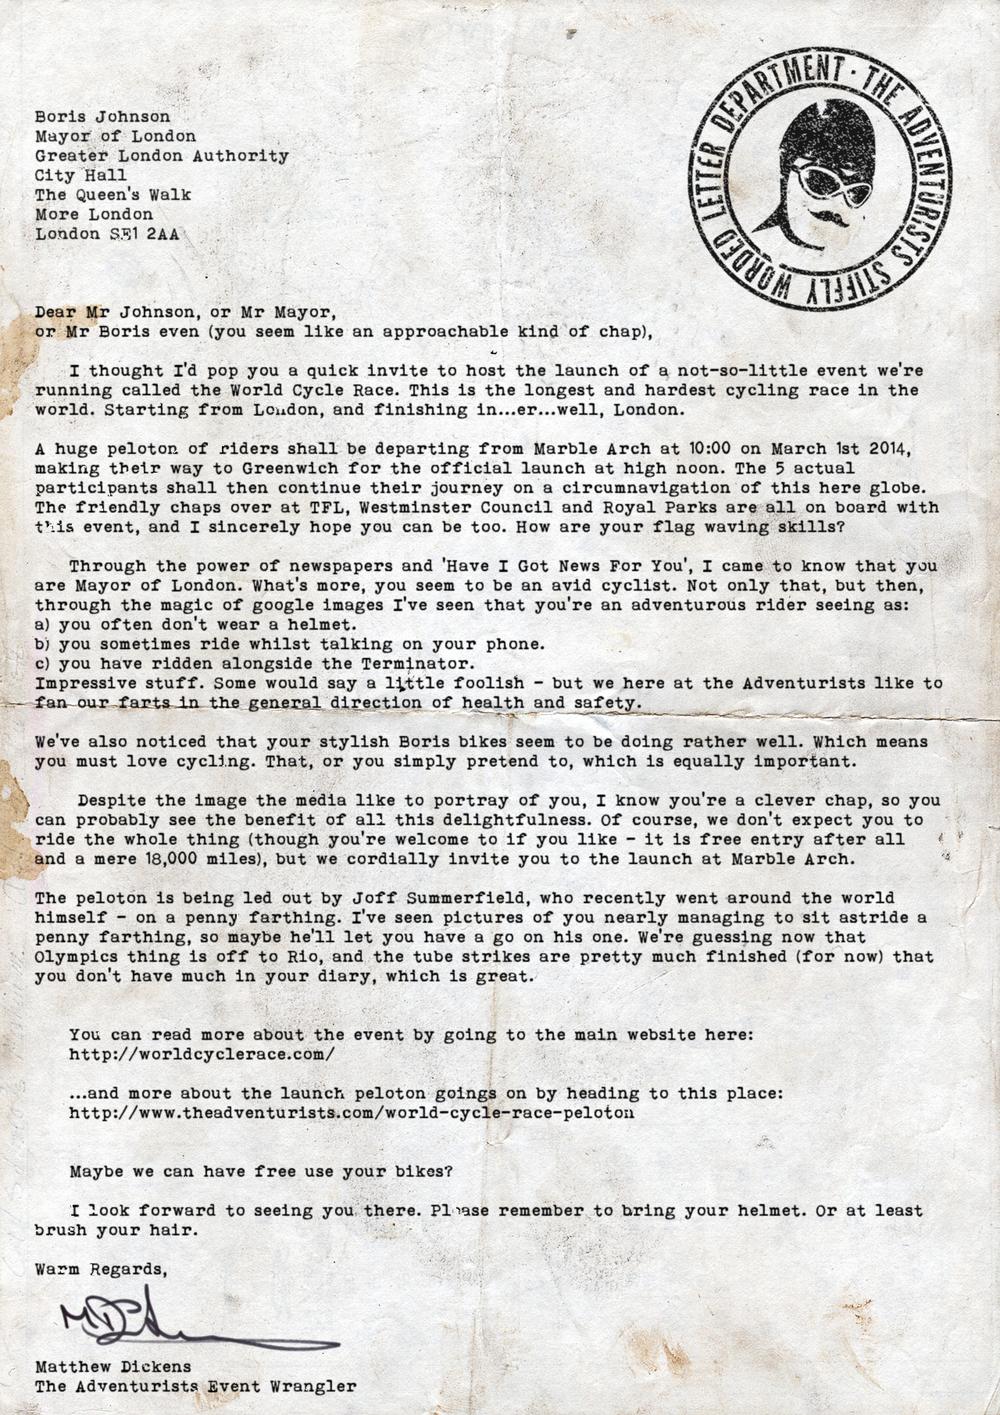 Boris Johnson Letter Typewriter Photoshop 700.jpg